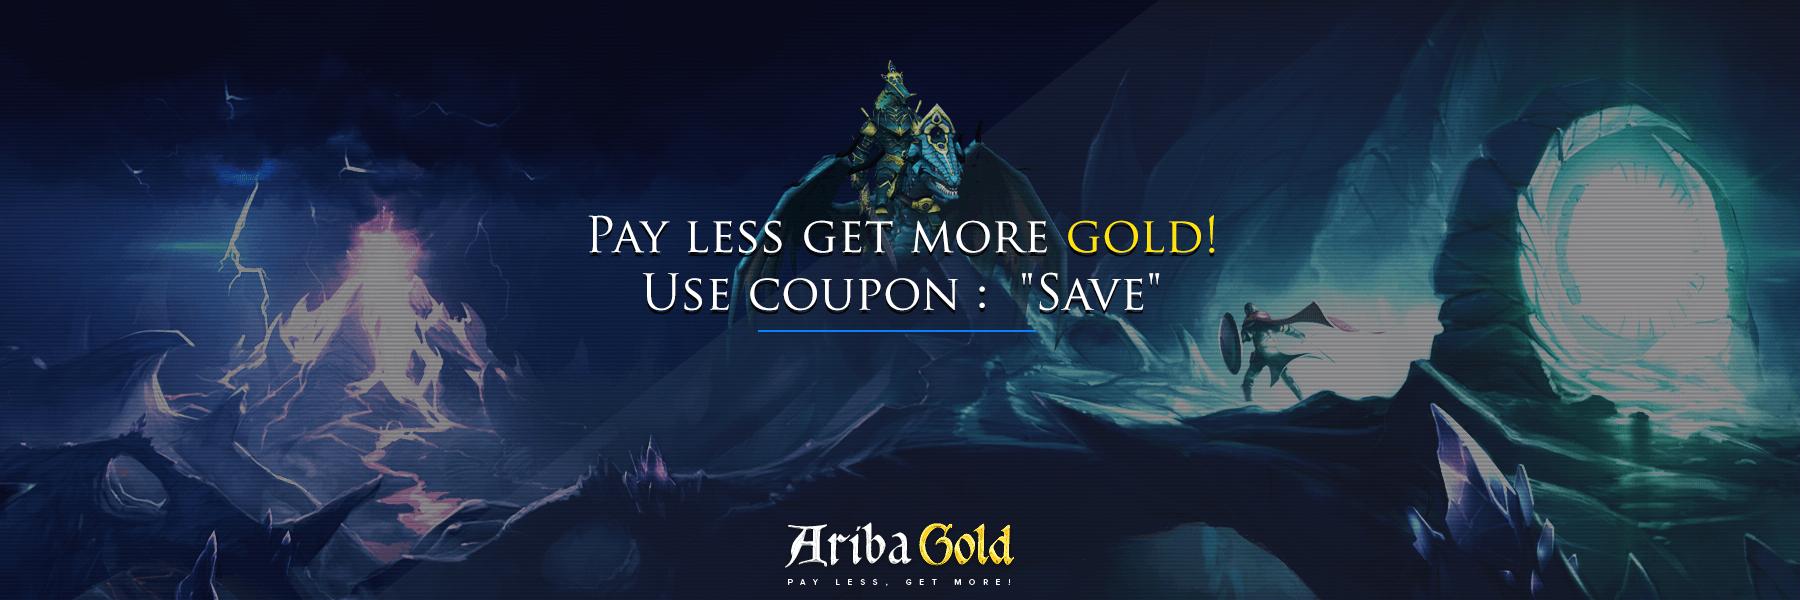 ariba gold buy runescape gold cheap osrs gold buy osrs gold